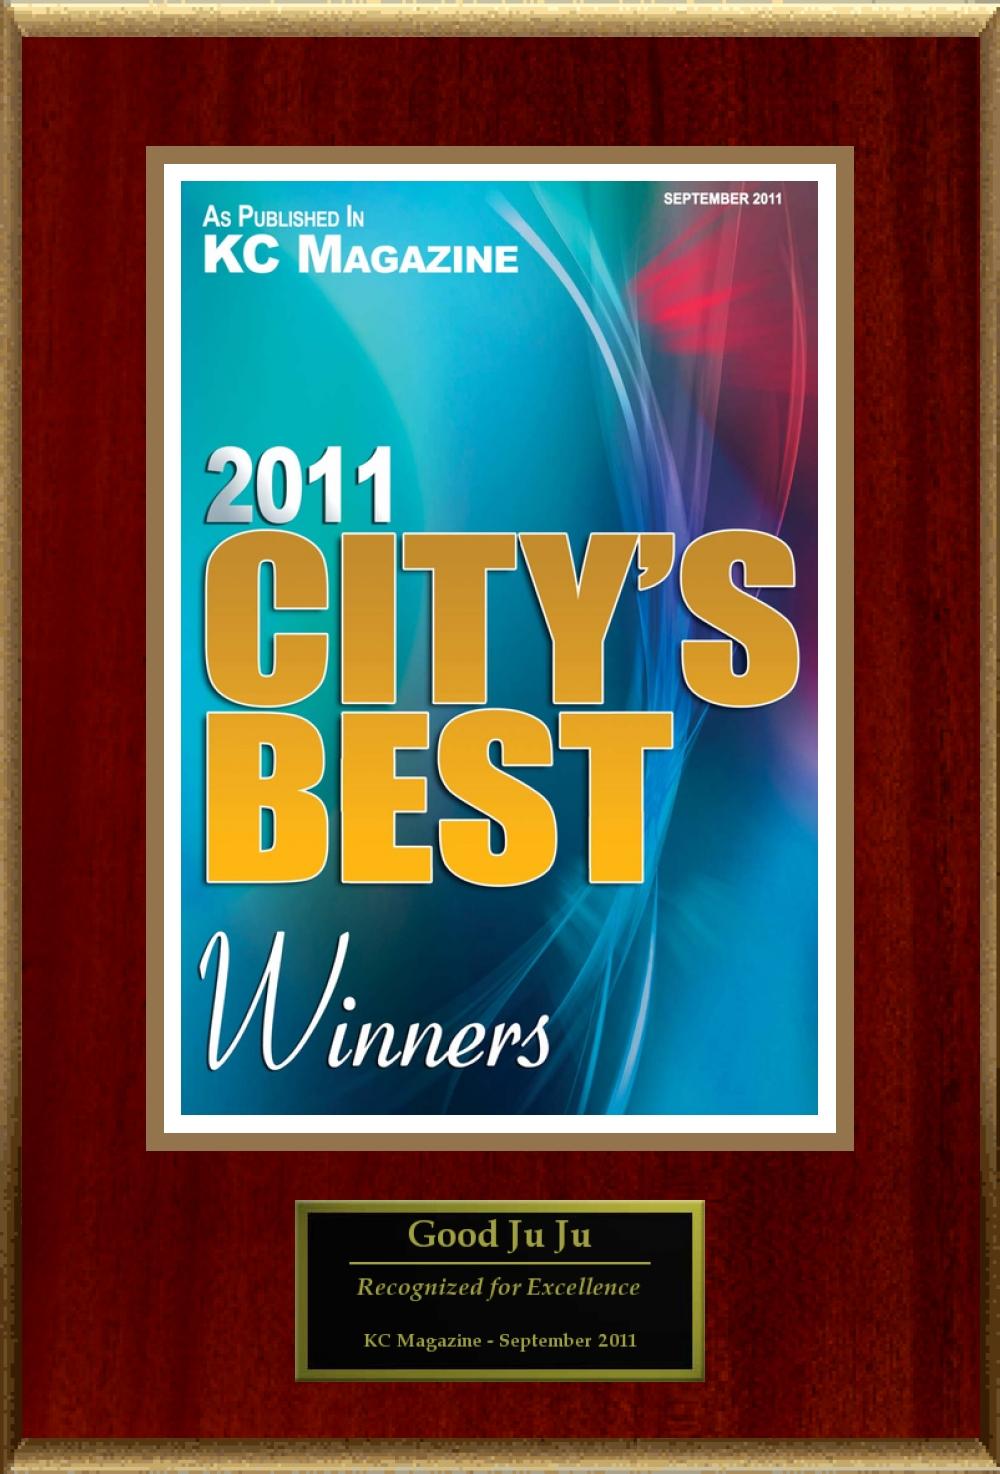 KC Magazine City's Best Award 2011